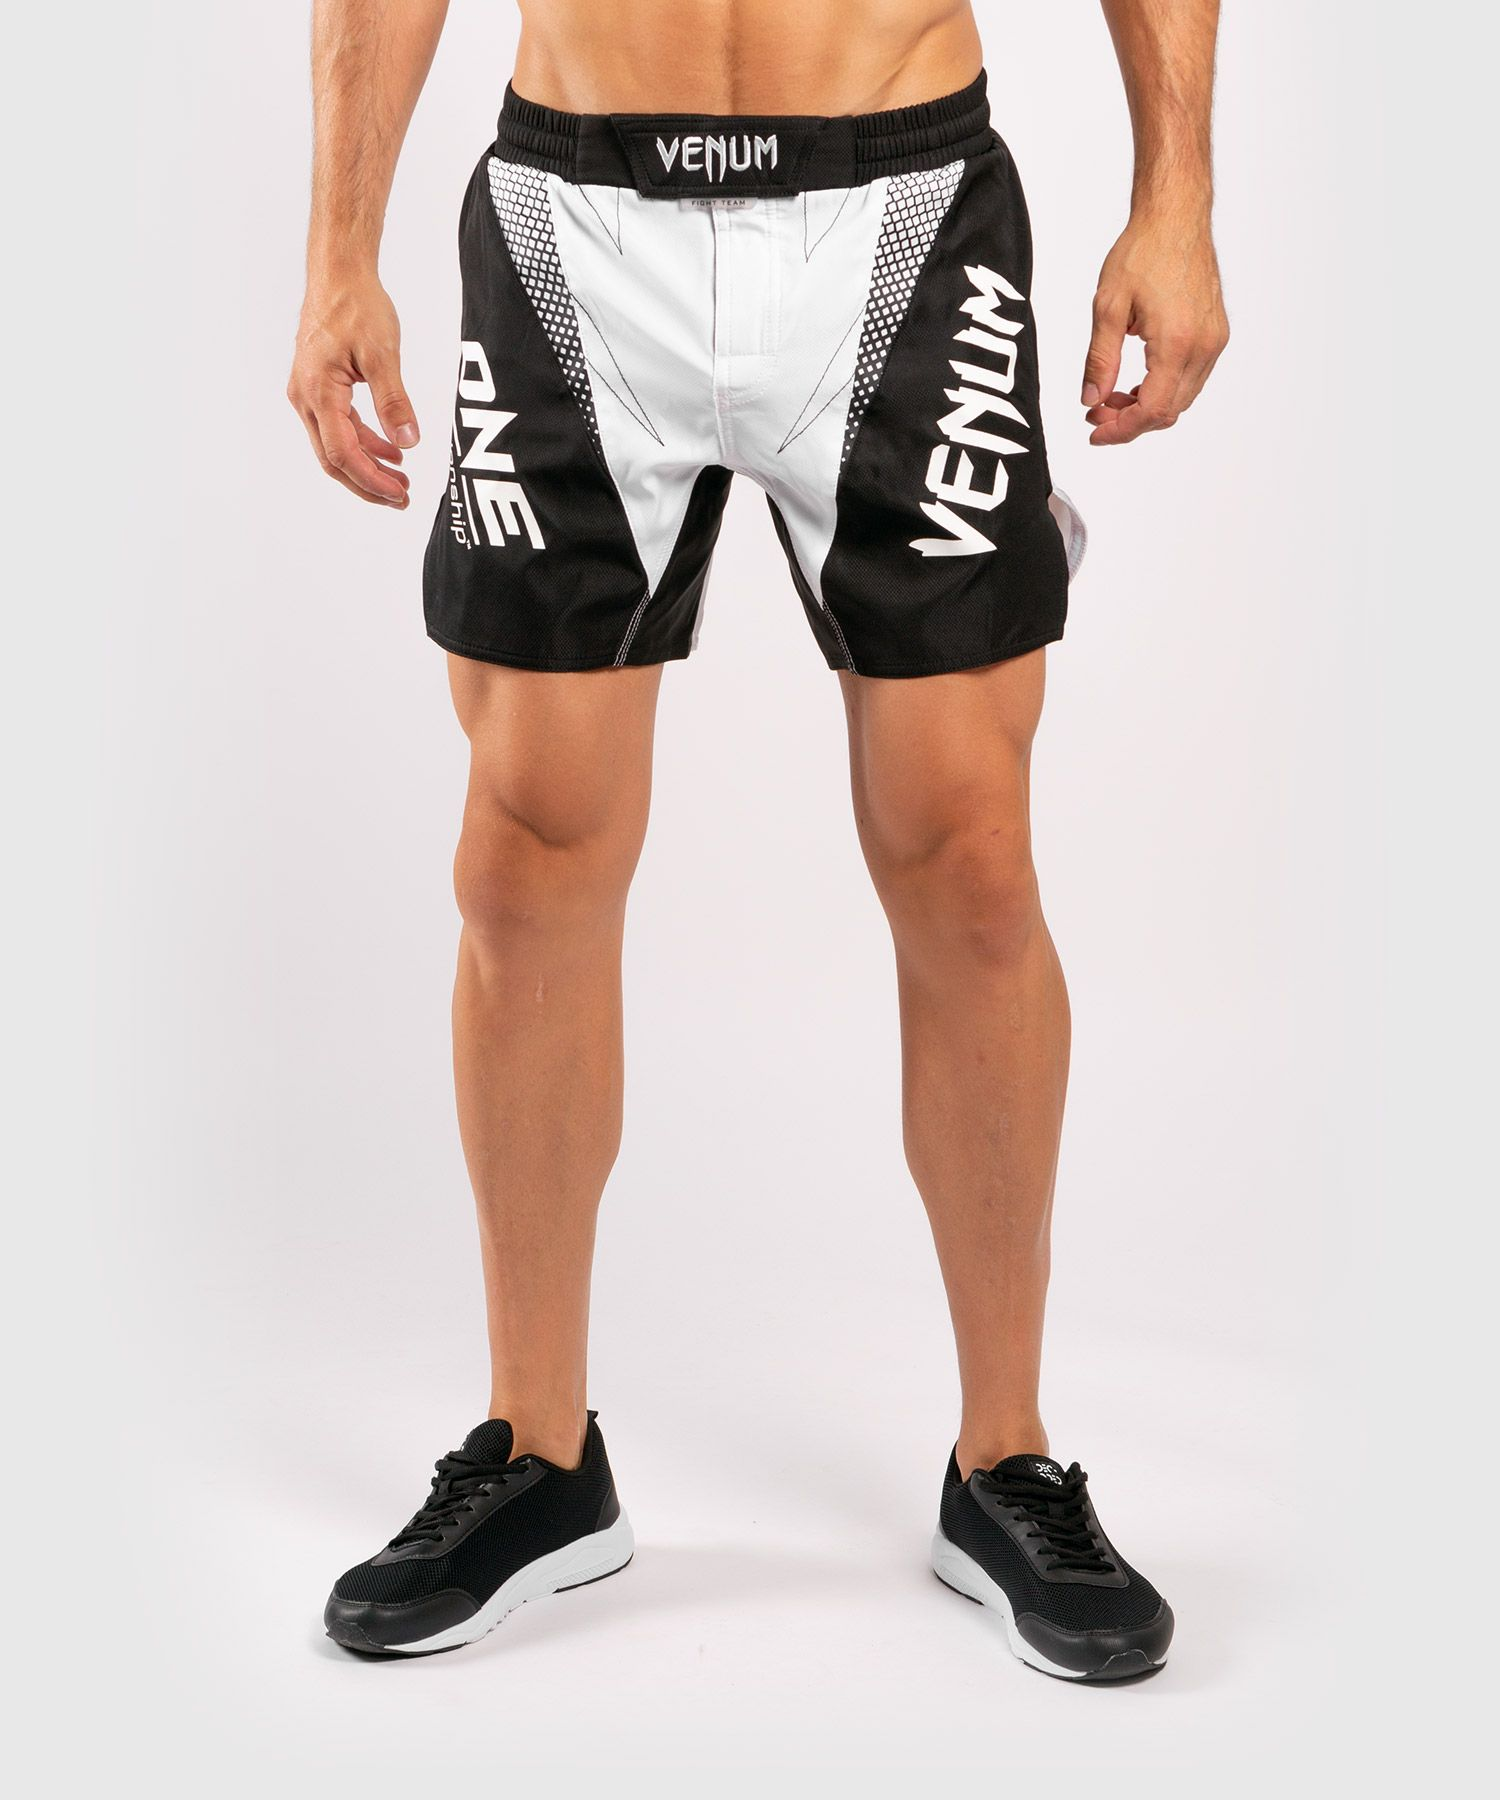 Fightshorts Venum x ONE FC - Blanc/Noir